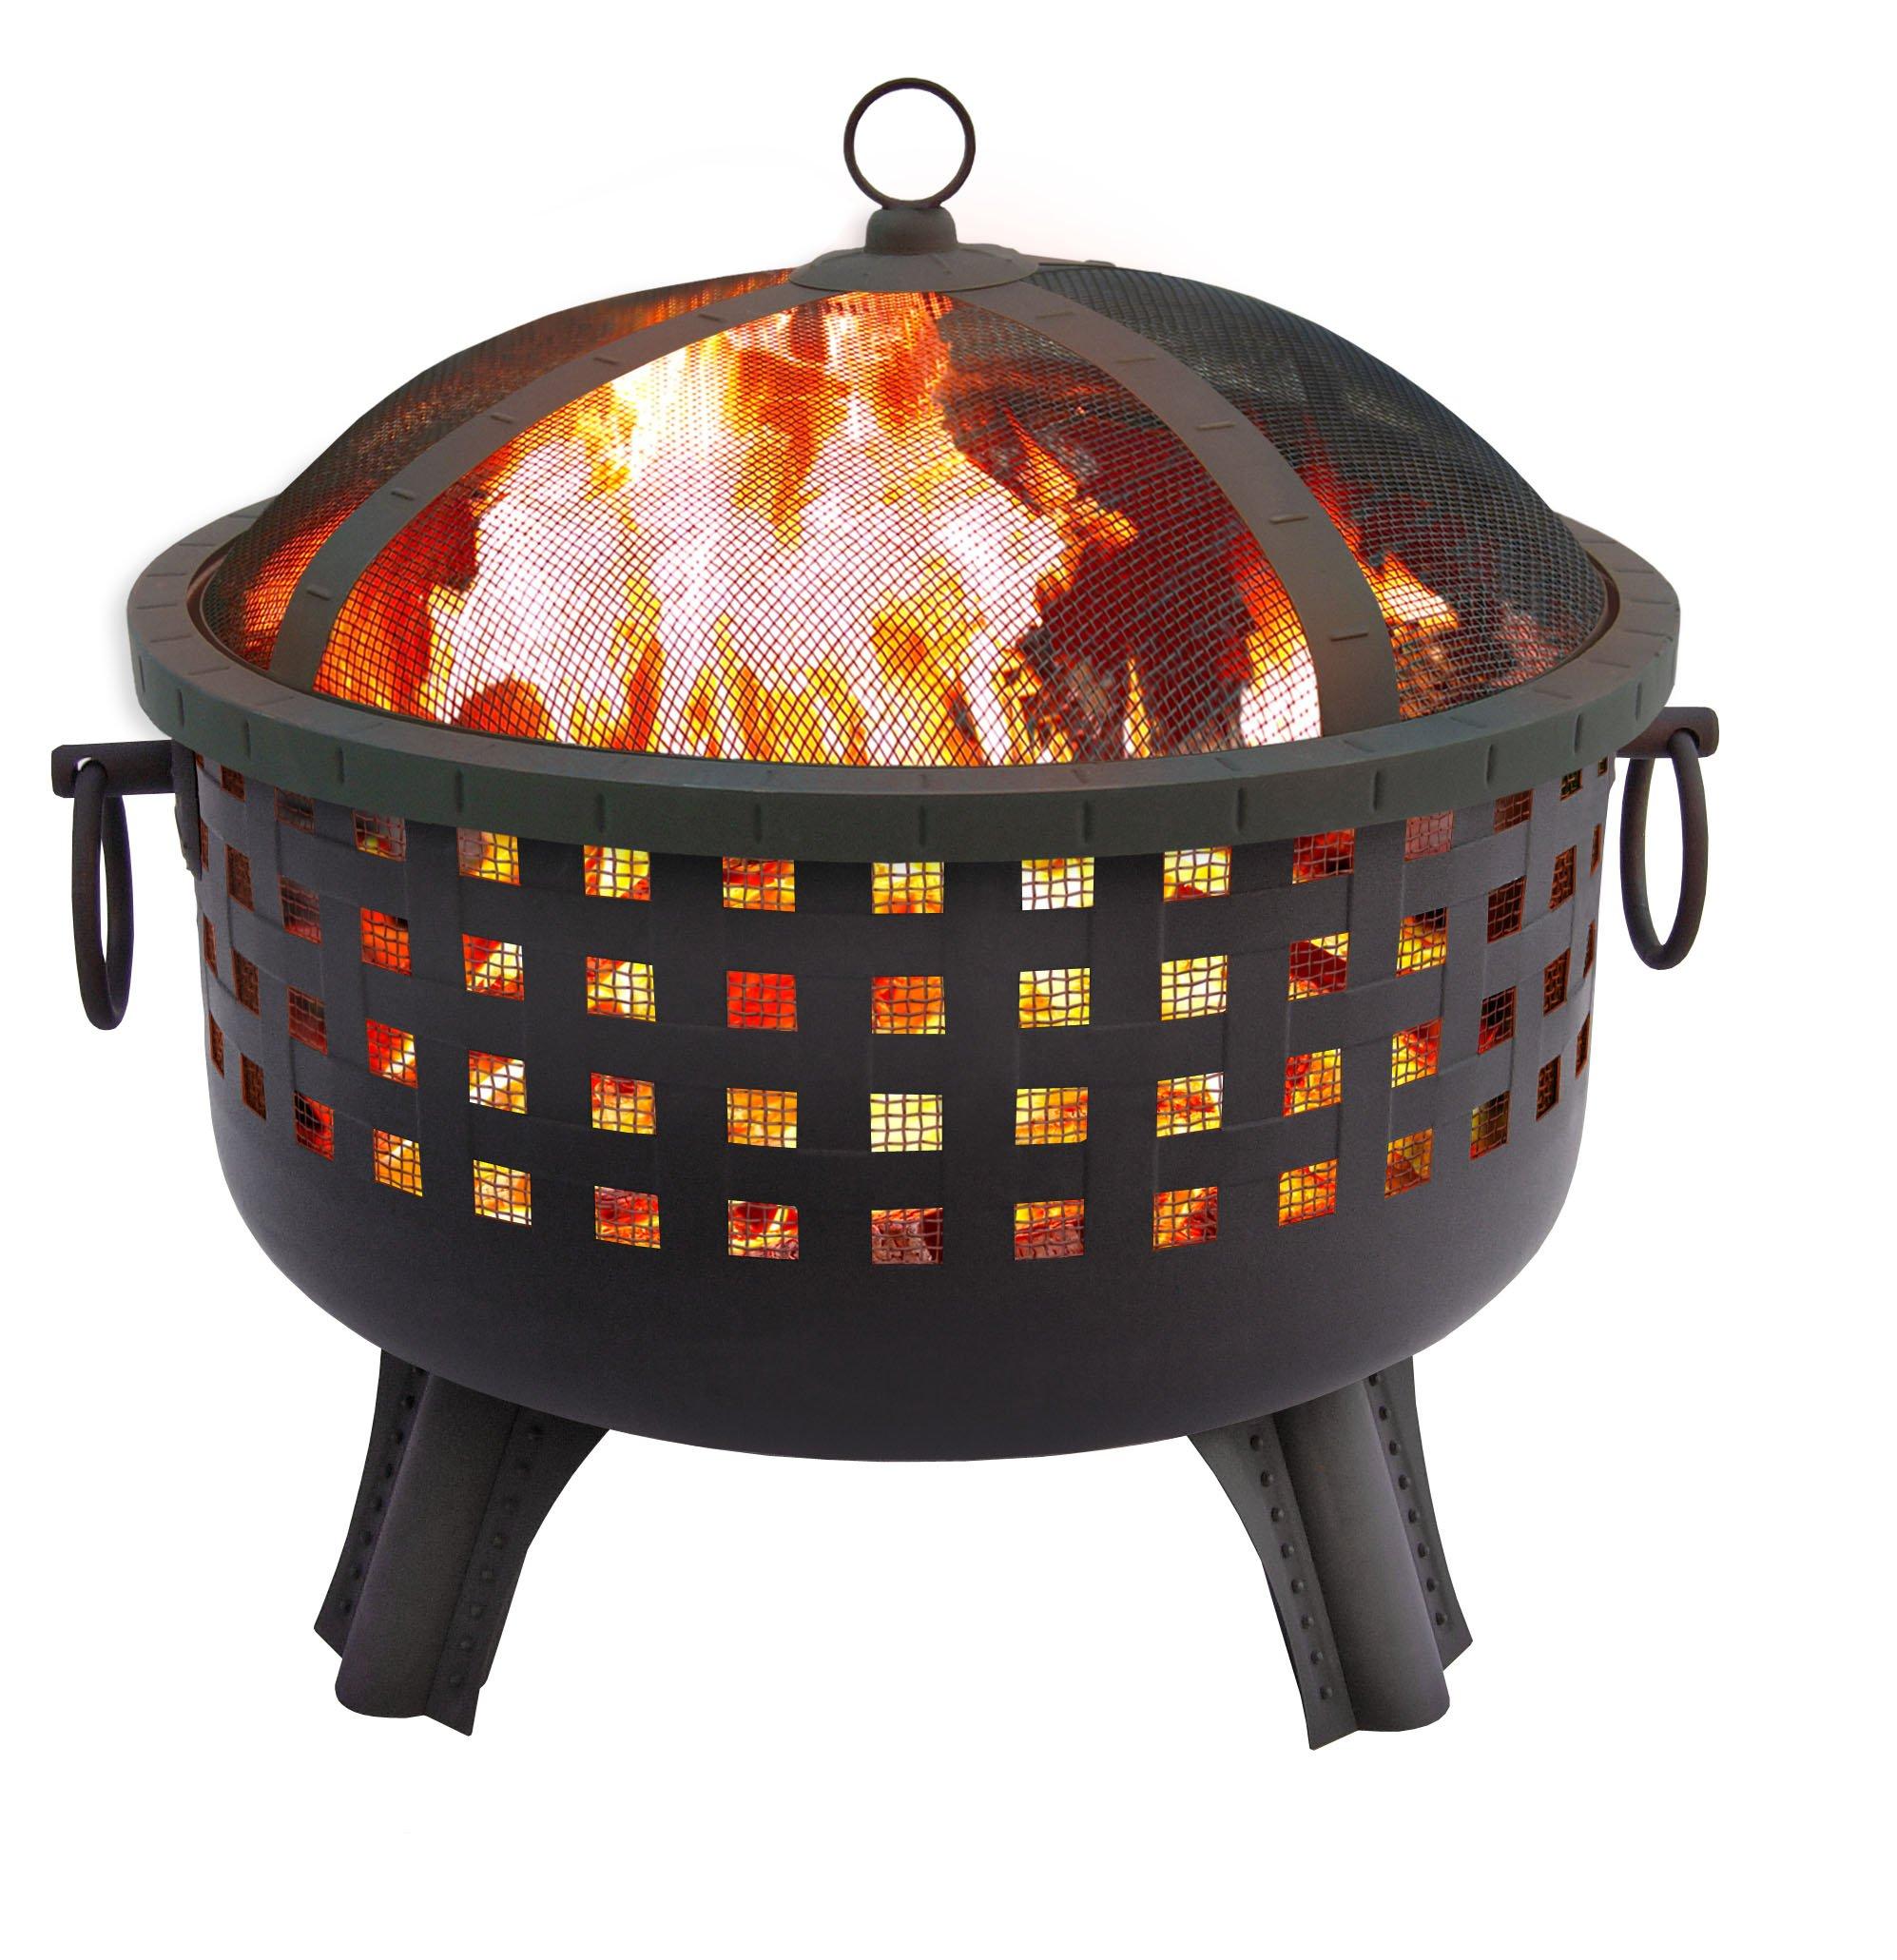 Landmann 26364 23-1/2-Inch Savannah Garden Light Fire Pit, Black by Landmann